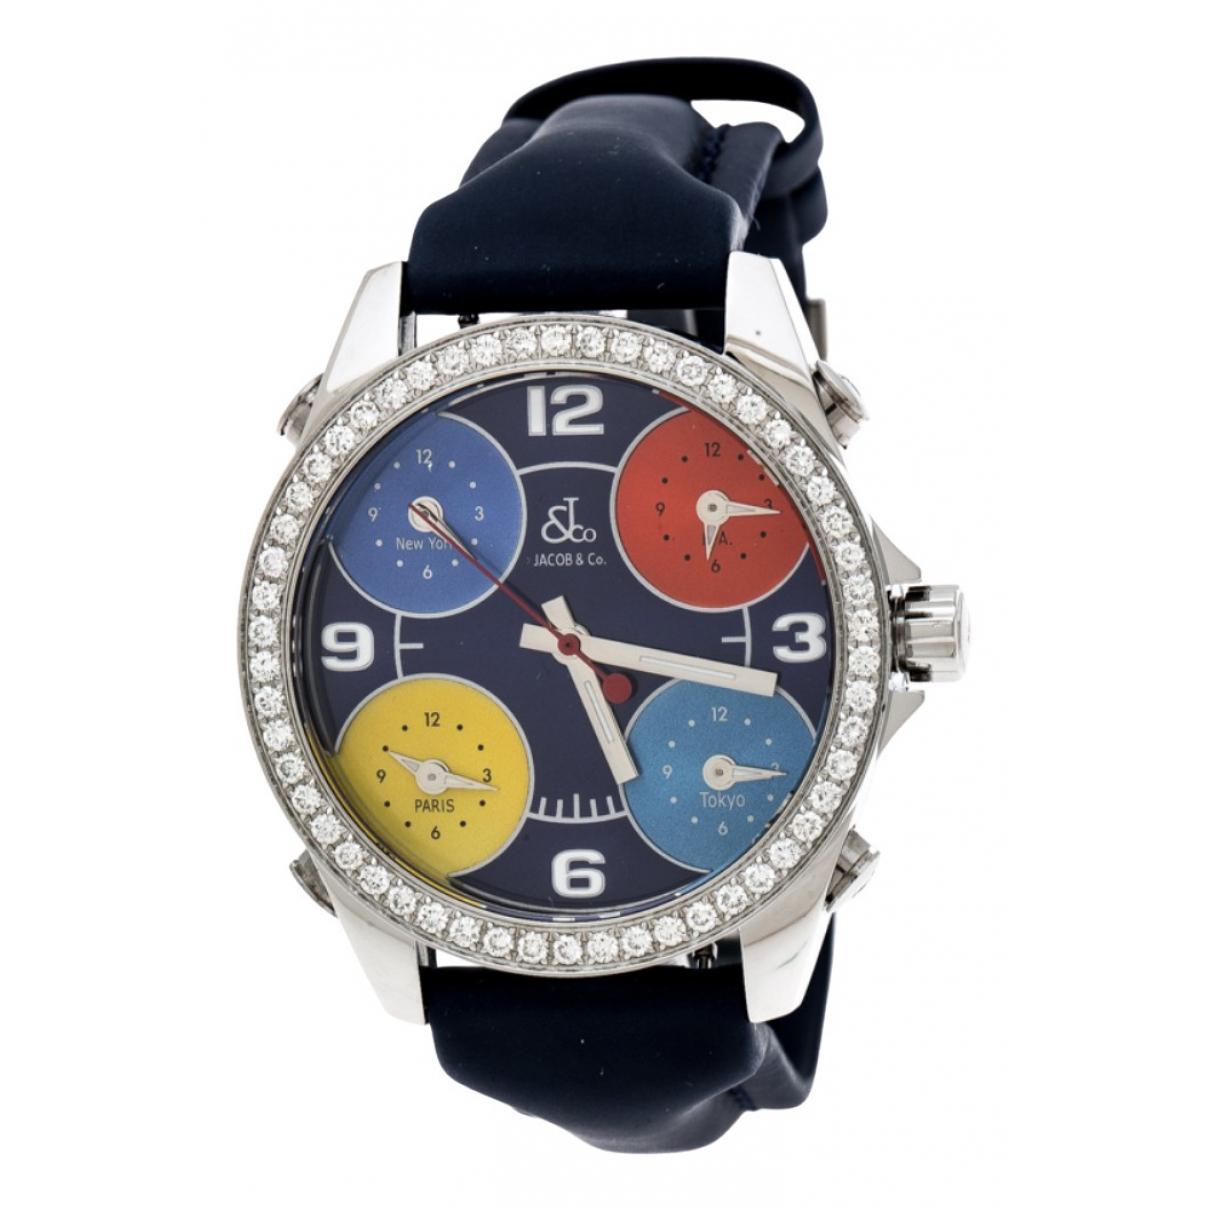 Relojes Jacob & Co